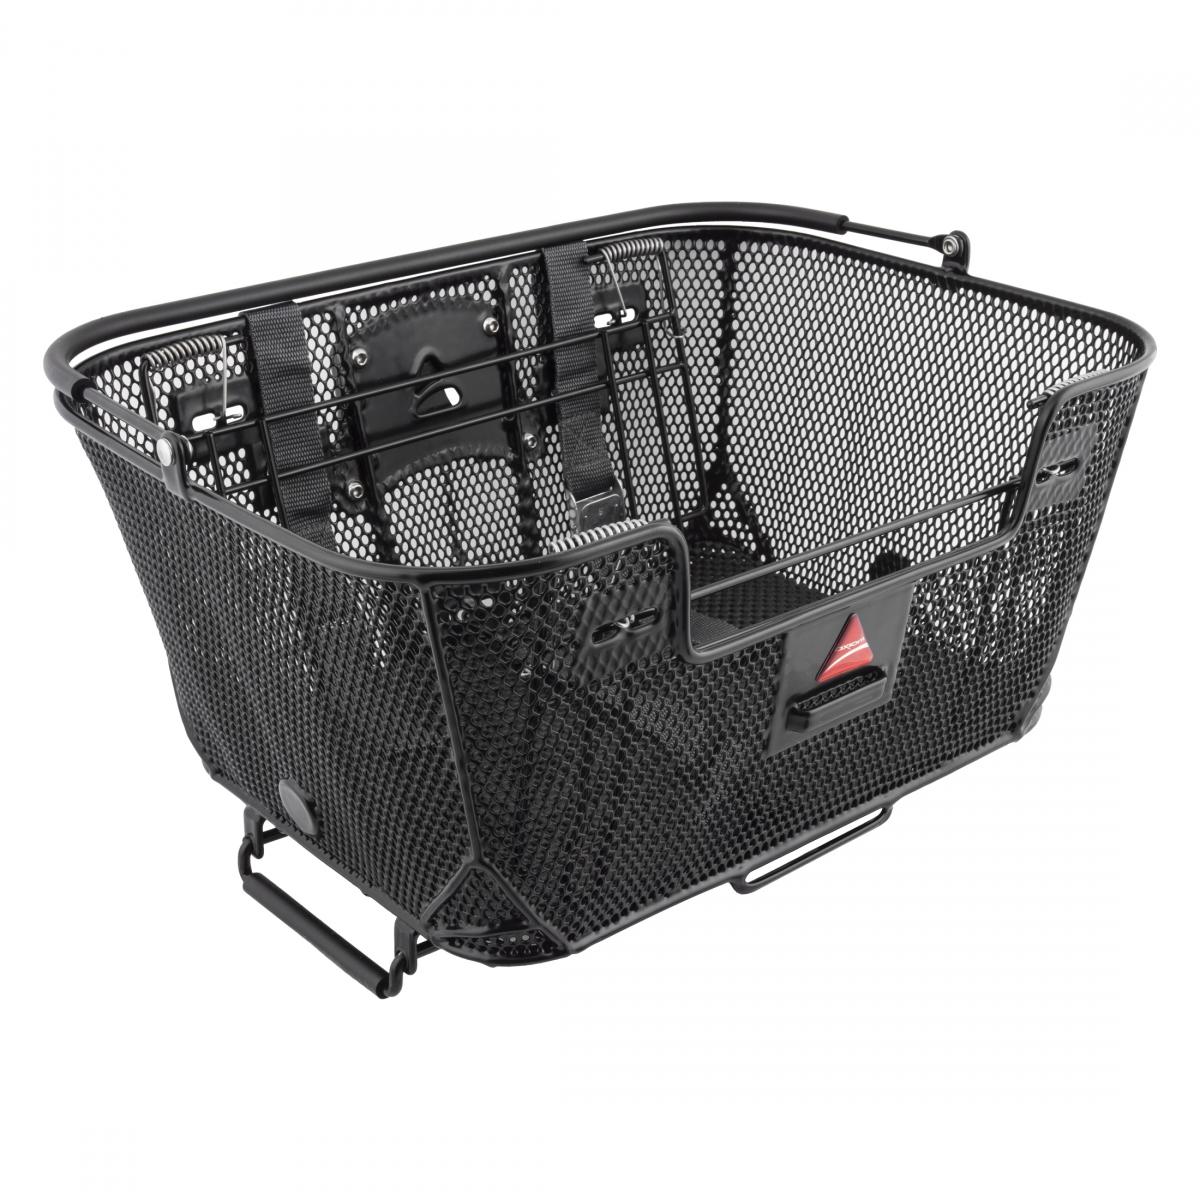 Axiom Market Basket LX Basket Axiom Rr Ractop Market Basket Lx Blk Mesh